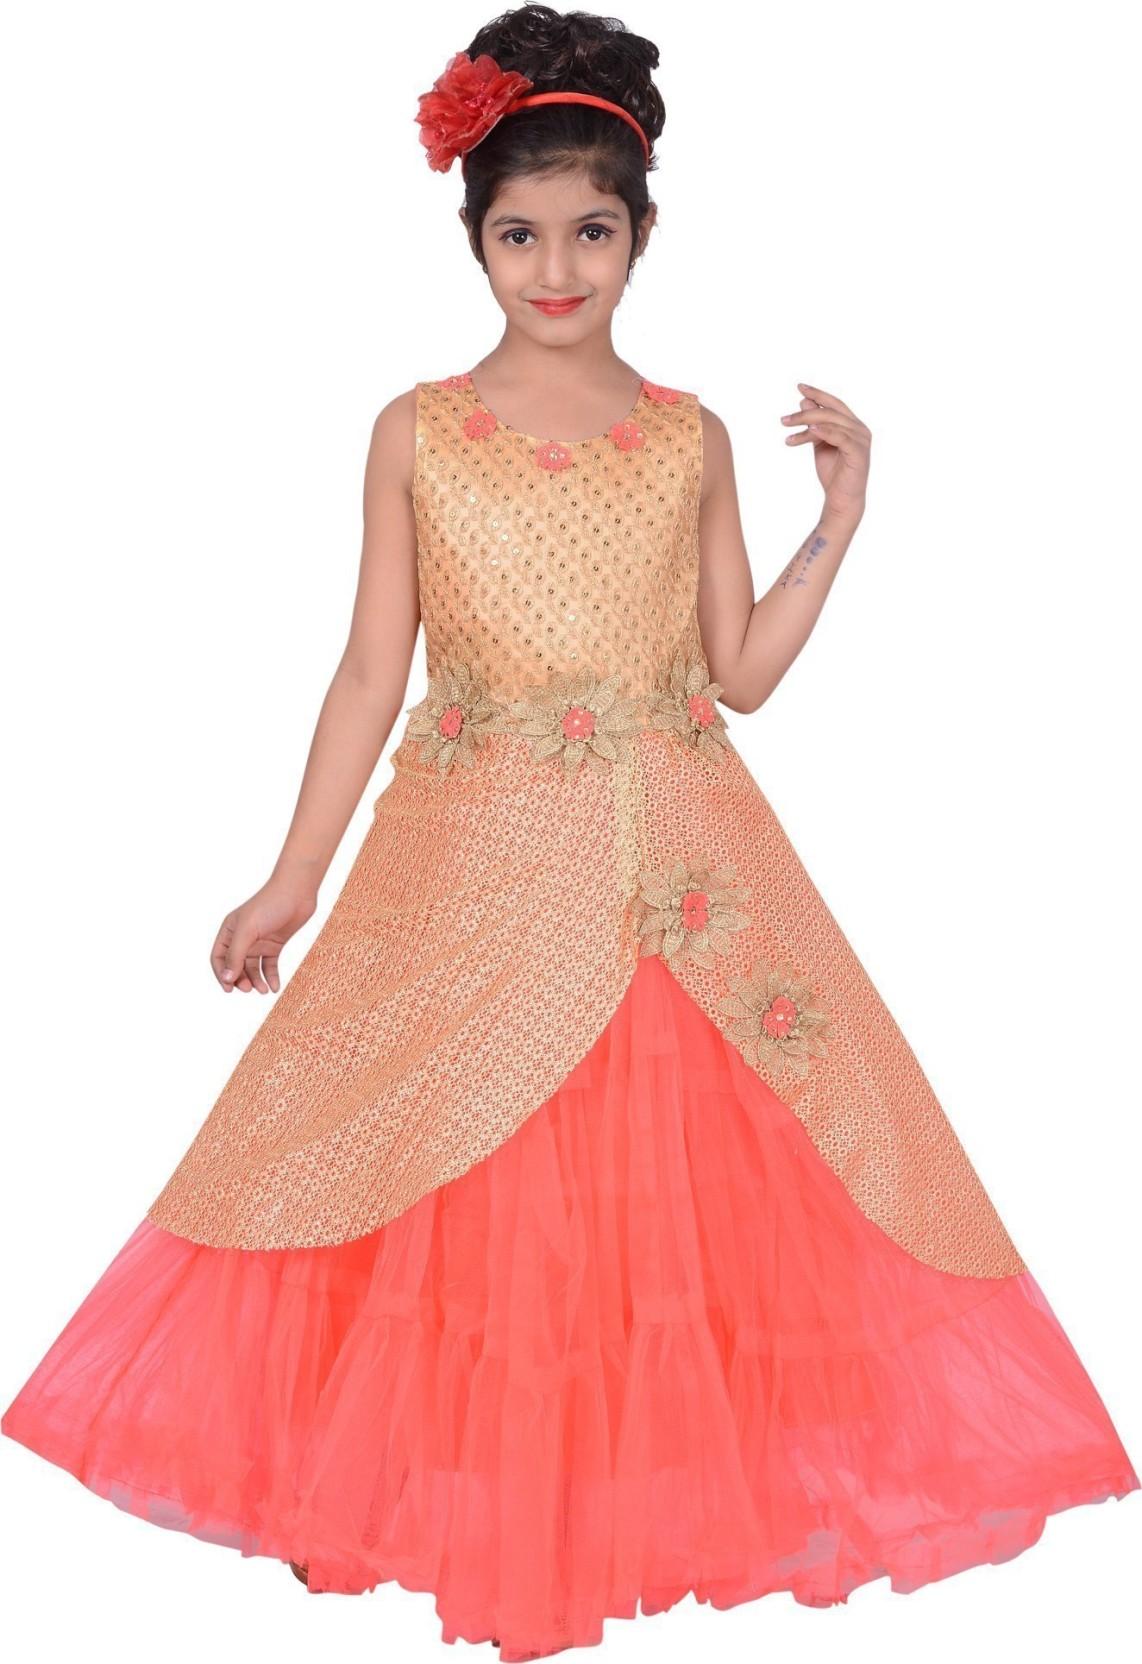 83375bdf8100d Flipkart Online Shopping Dresses Childrens - raveitsafe